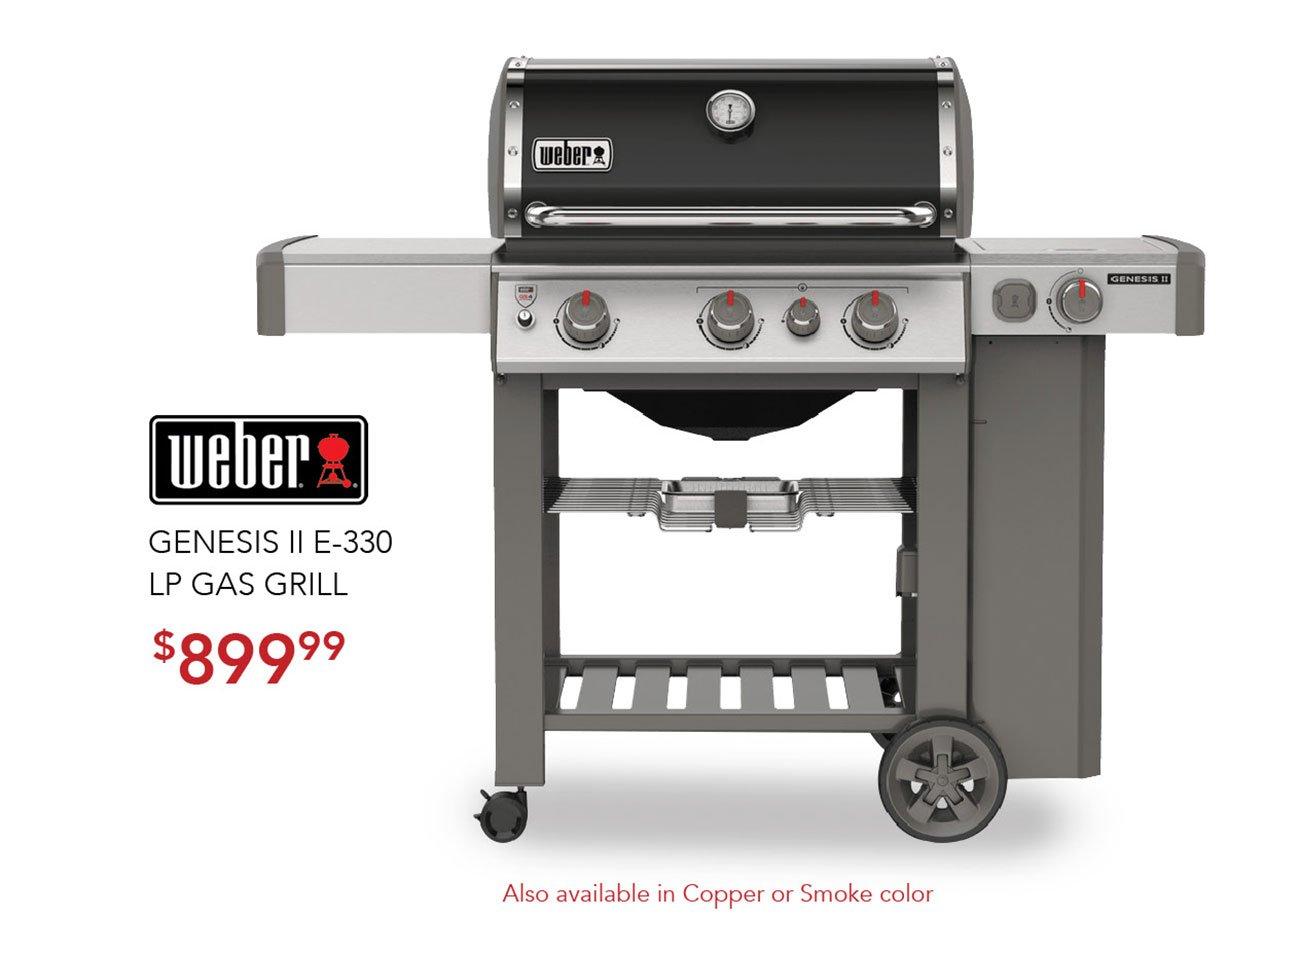 Weber-gas-grill